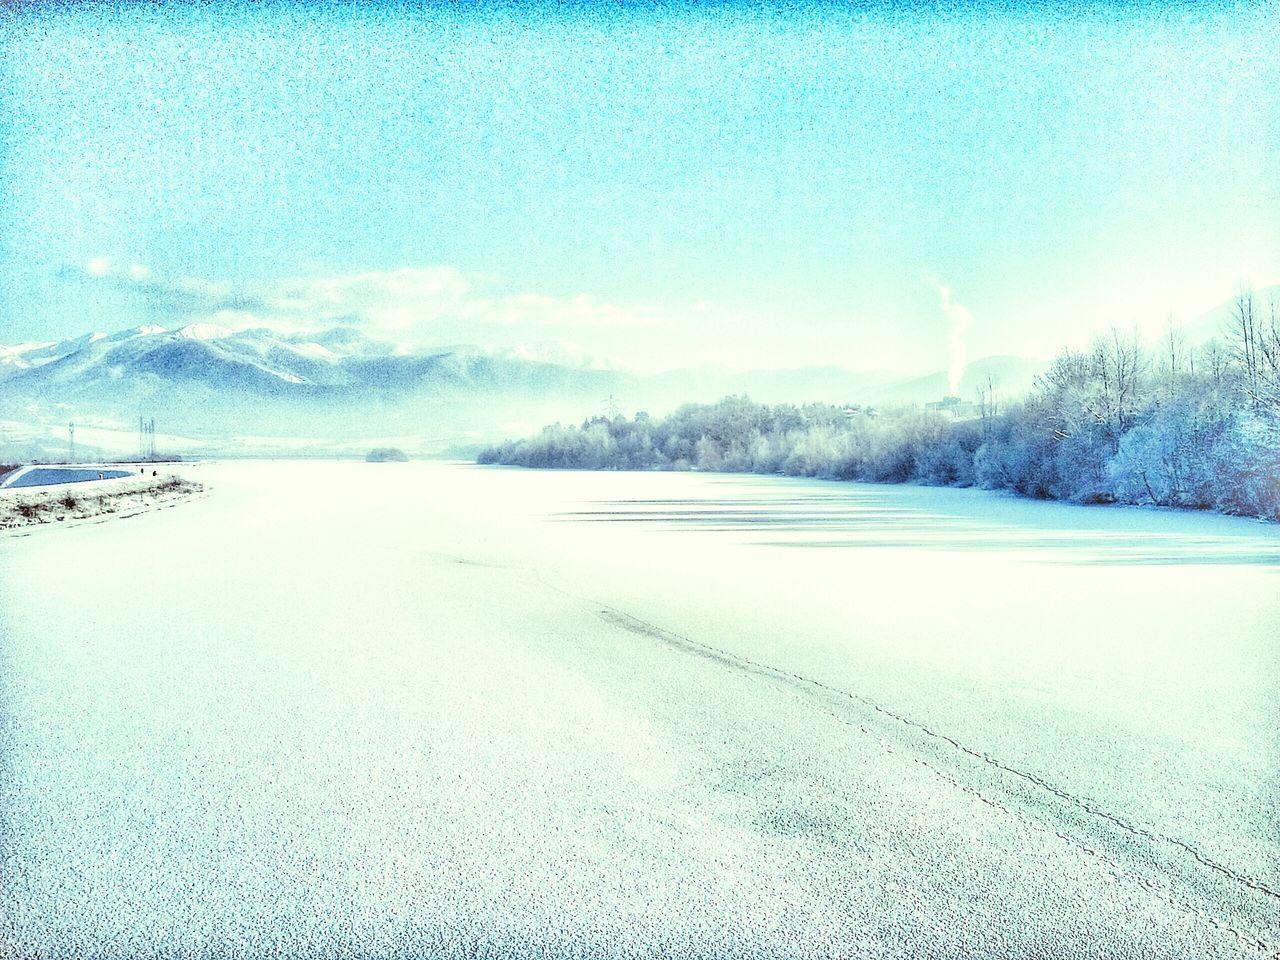 Winter Landscape Frozen Nature Frozen River Ice Moutains Sunny Day Pastel Shades Pastel Power Pastel Blue